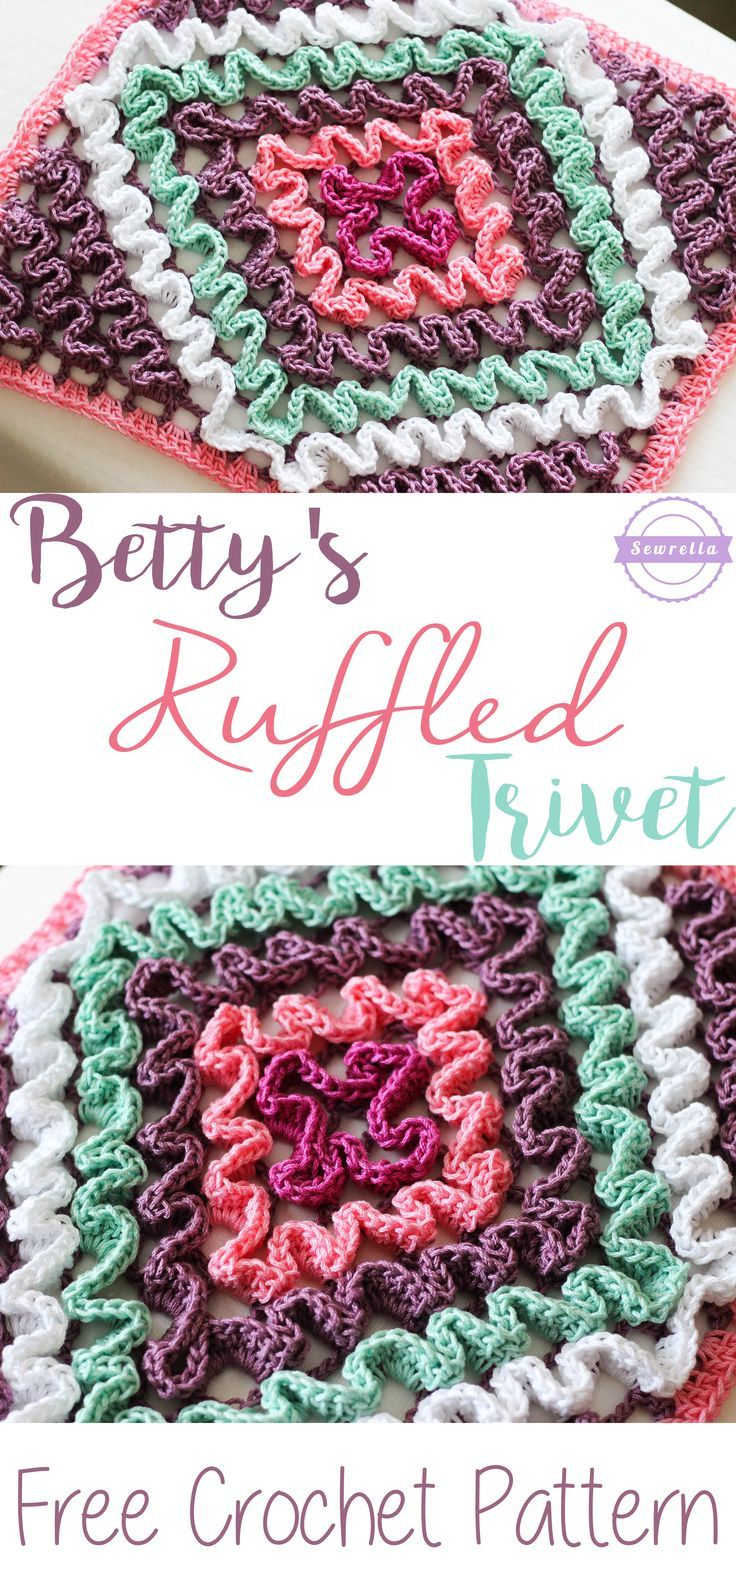 Betty's Ruffled Trivet | Free Crochet Pattern from Sewrella